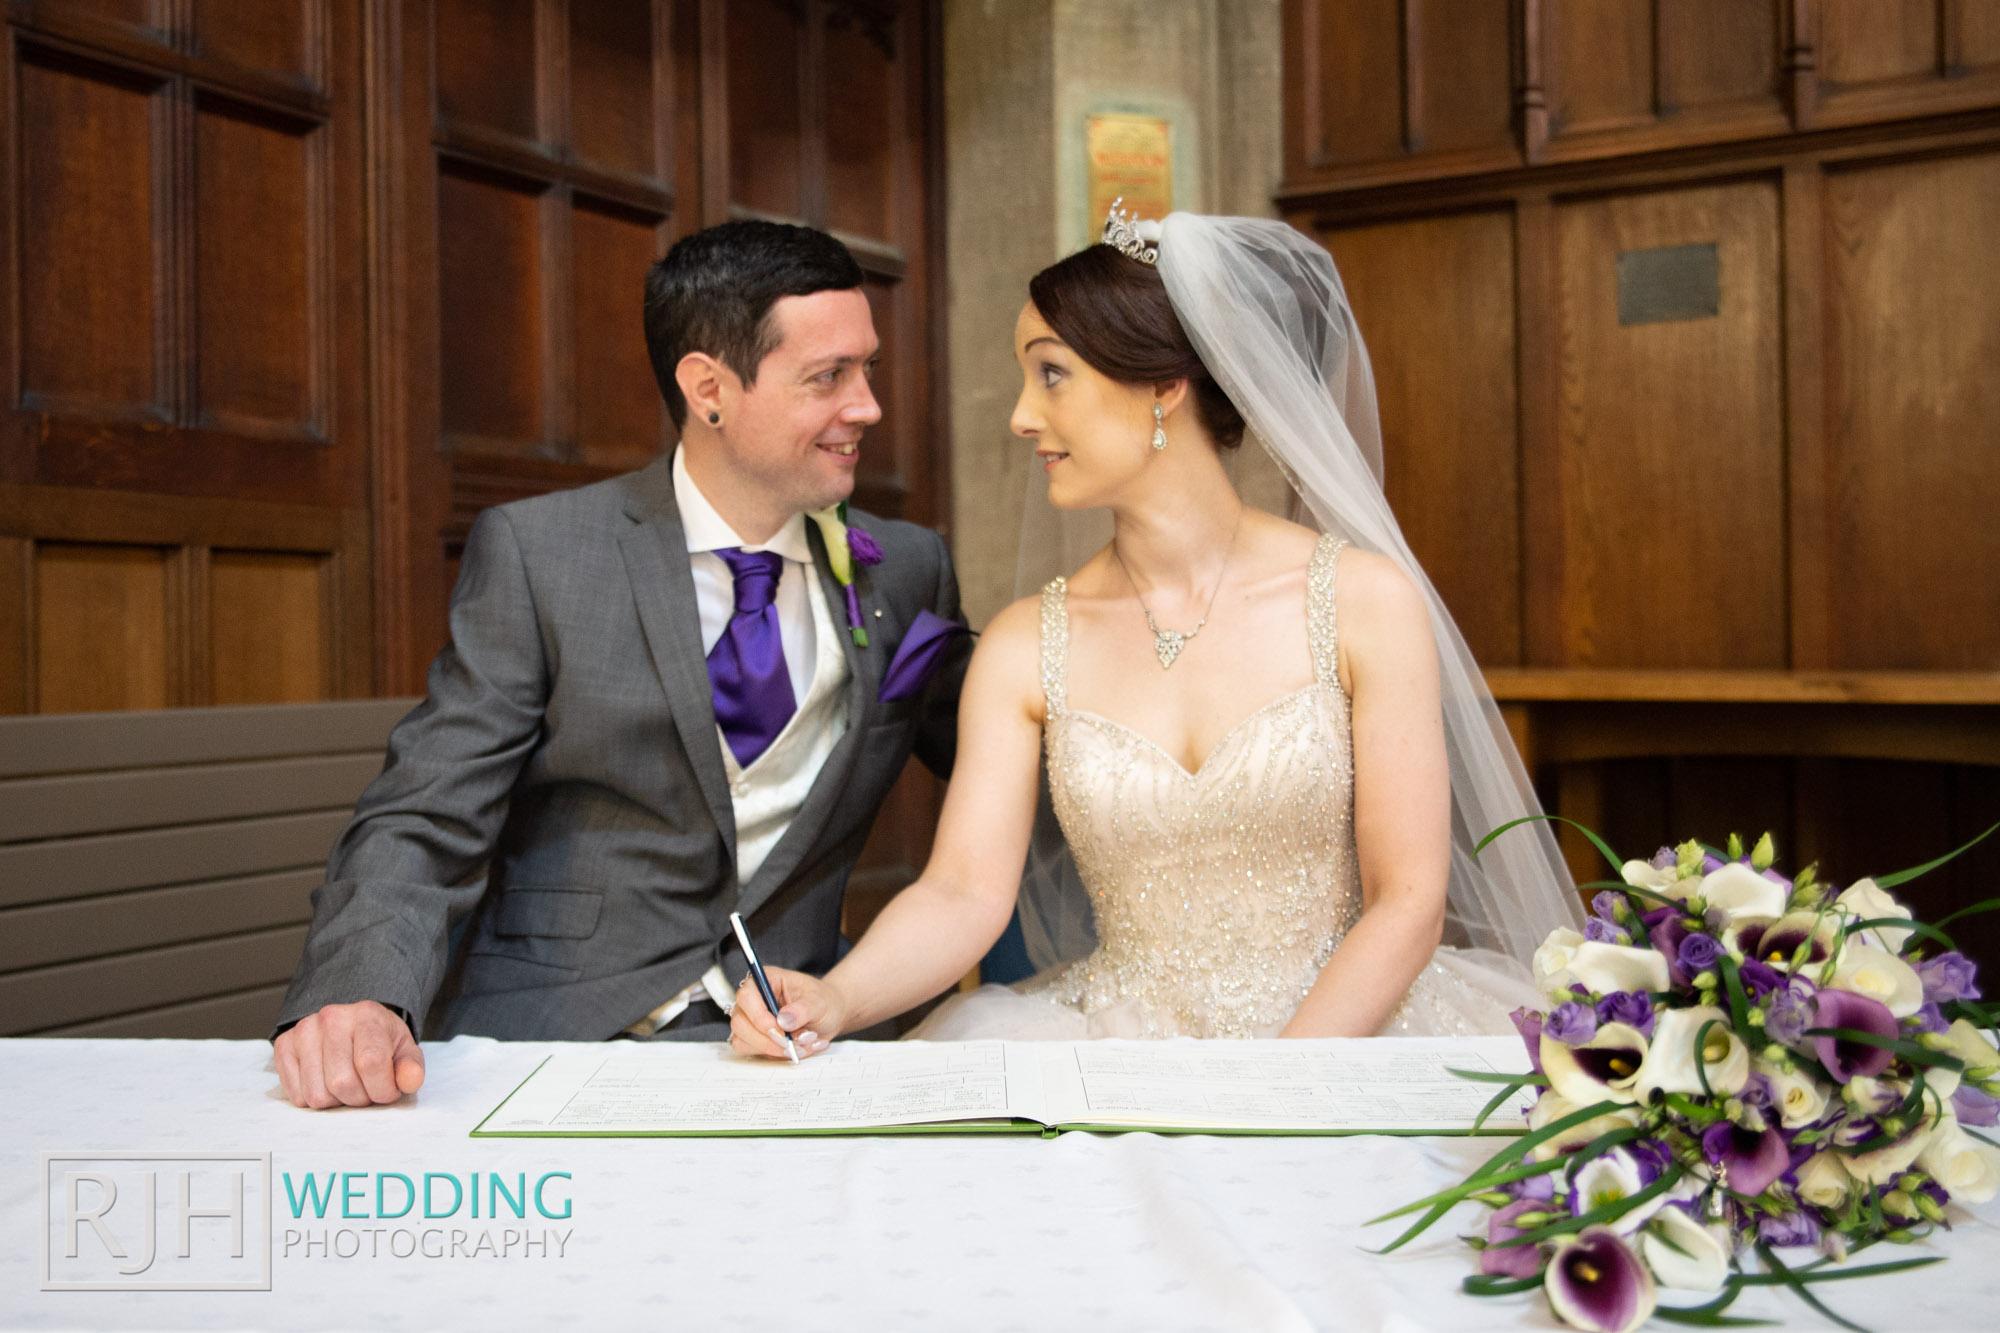 Oulton Hall Wedding Photography_Goodwill-Hall_026_IMG_6428.jpg